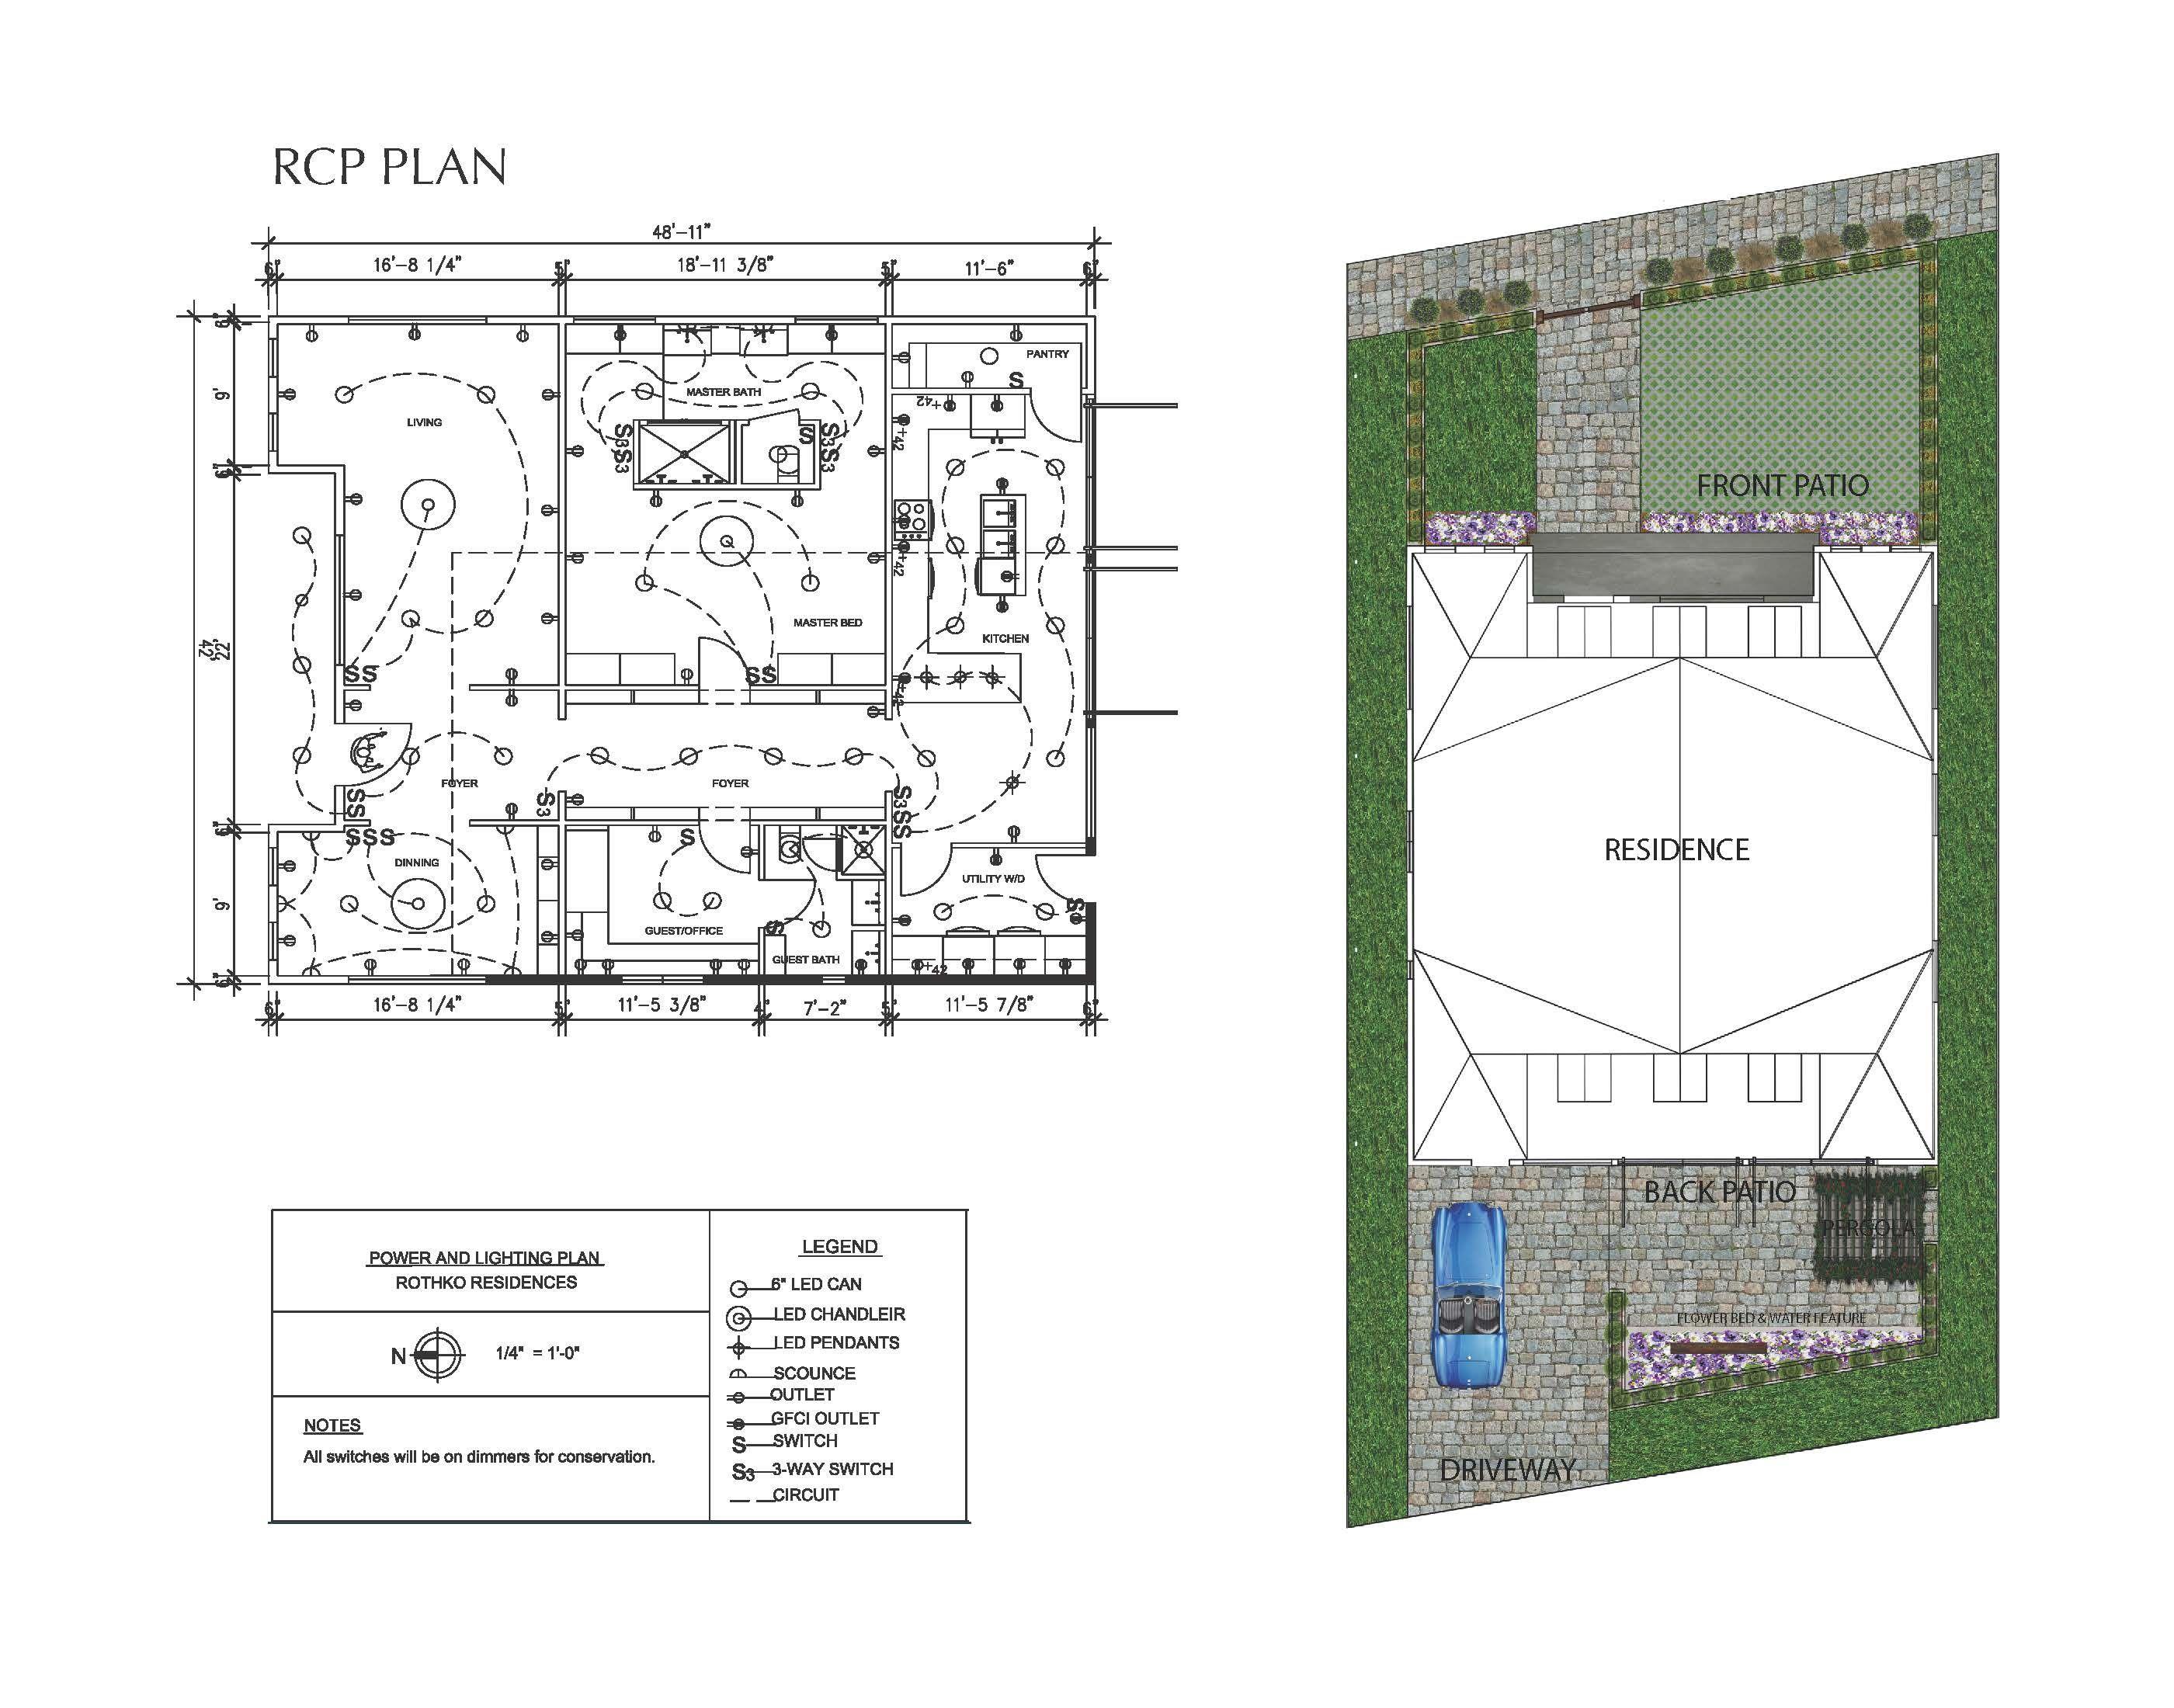 electrical floor plan built in autocad exterior site plan built in rh pinterest com